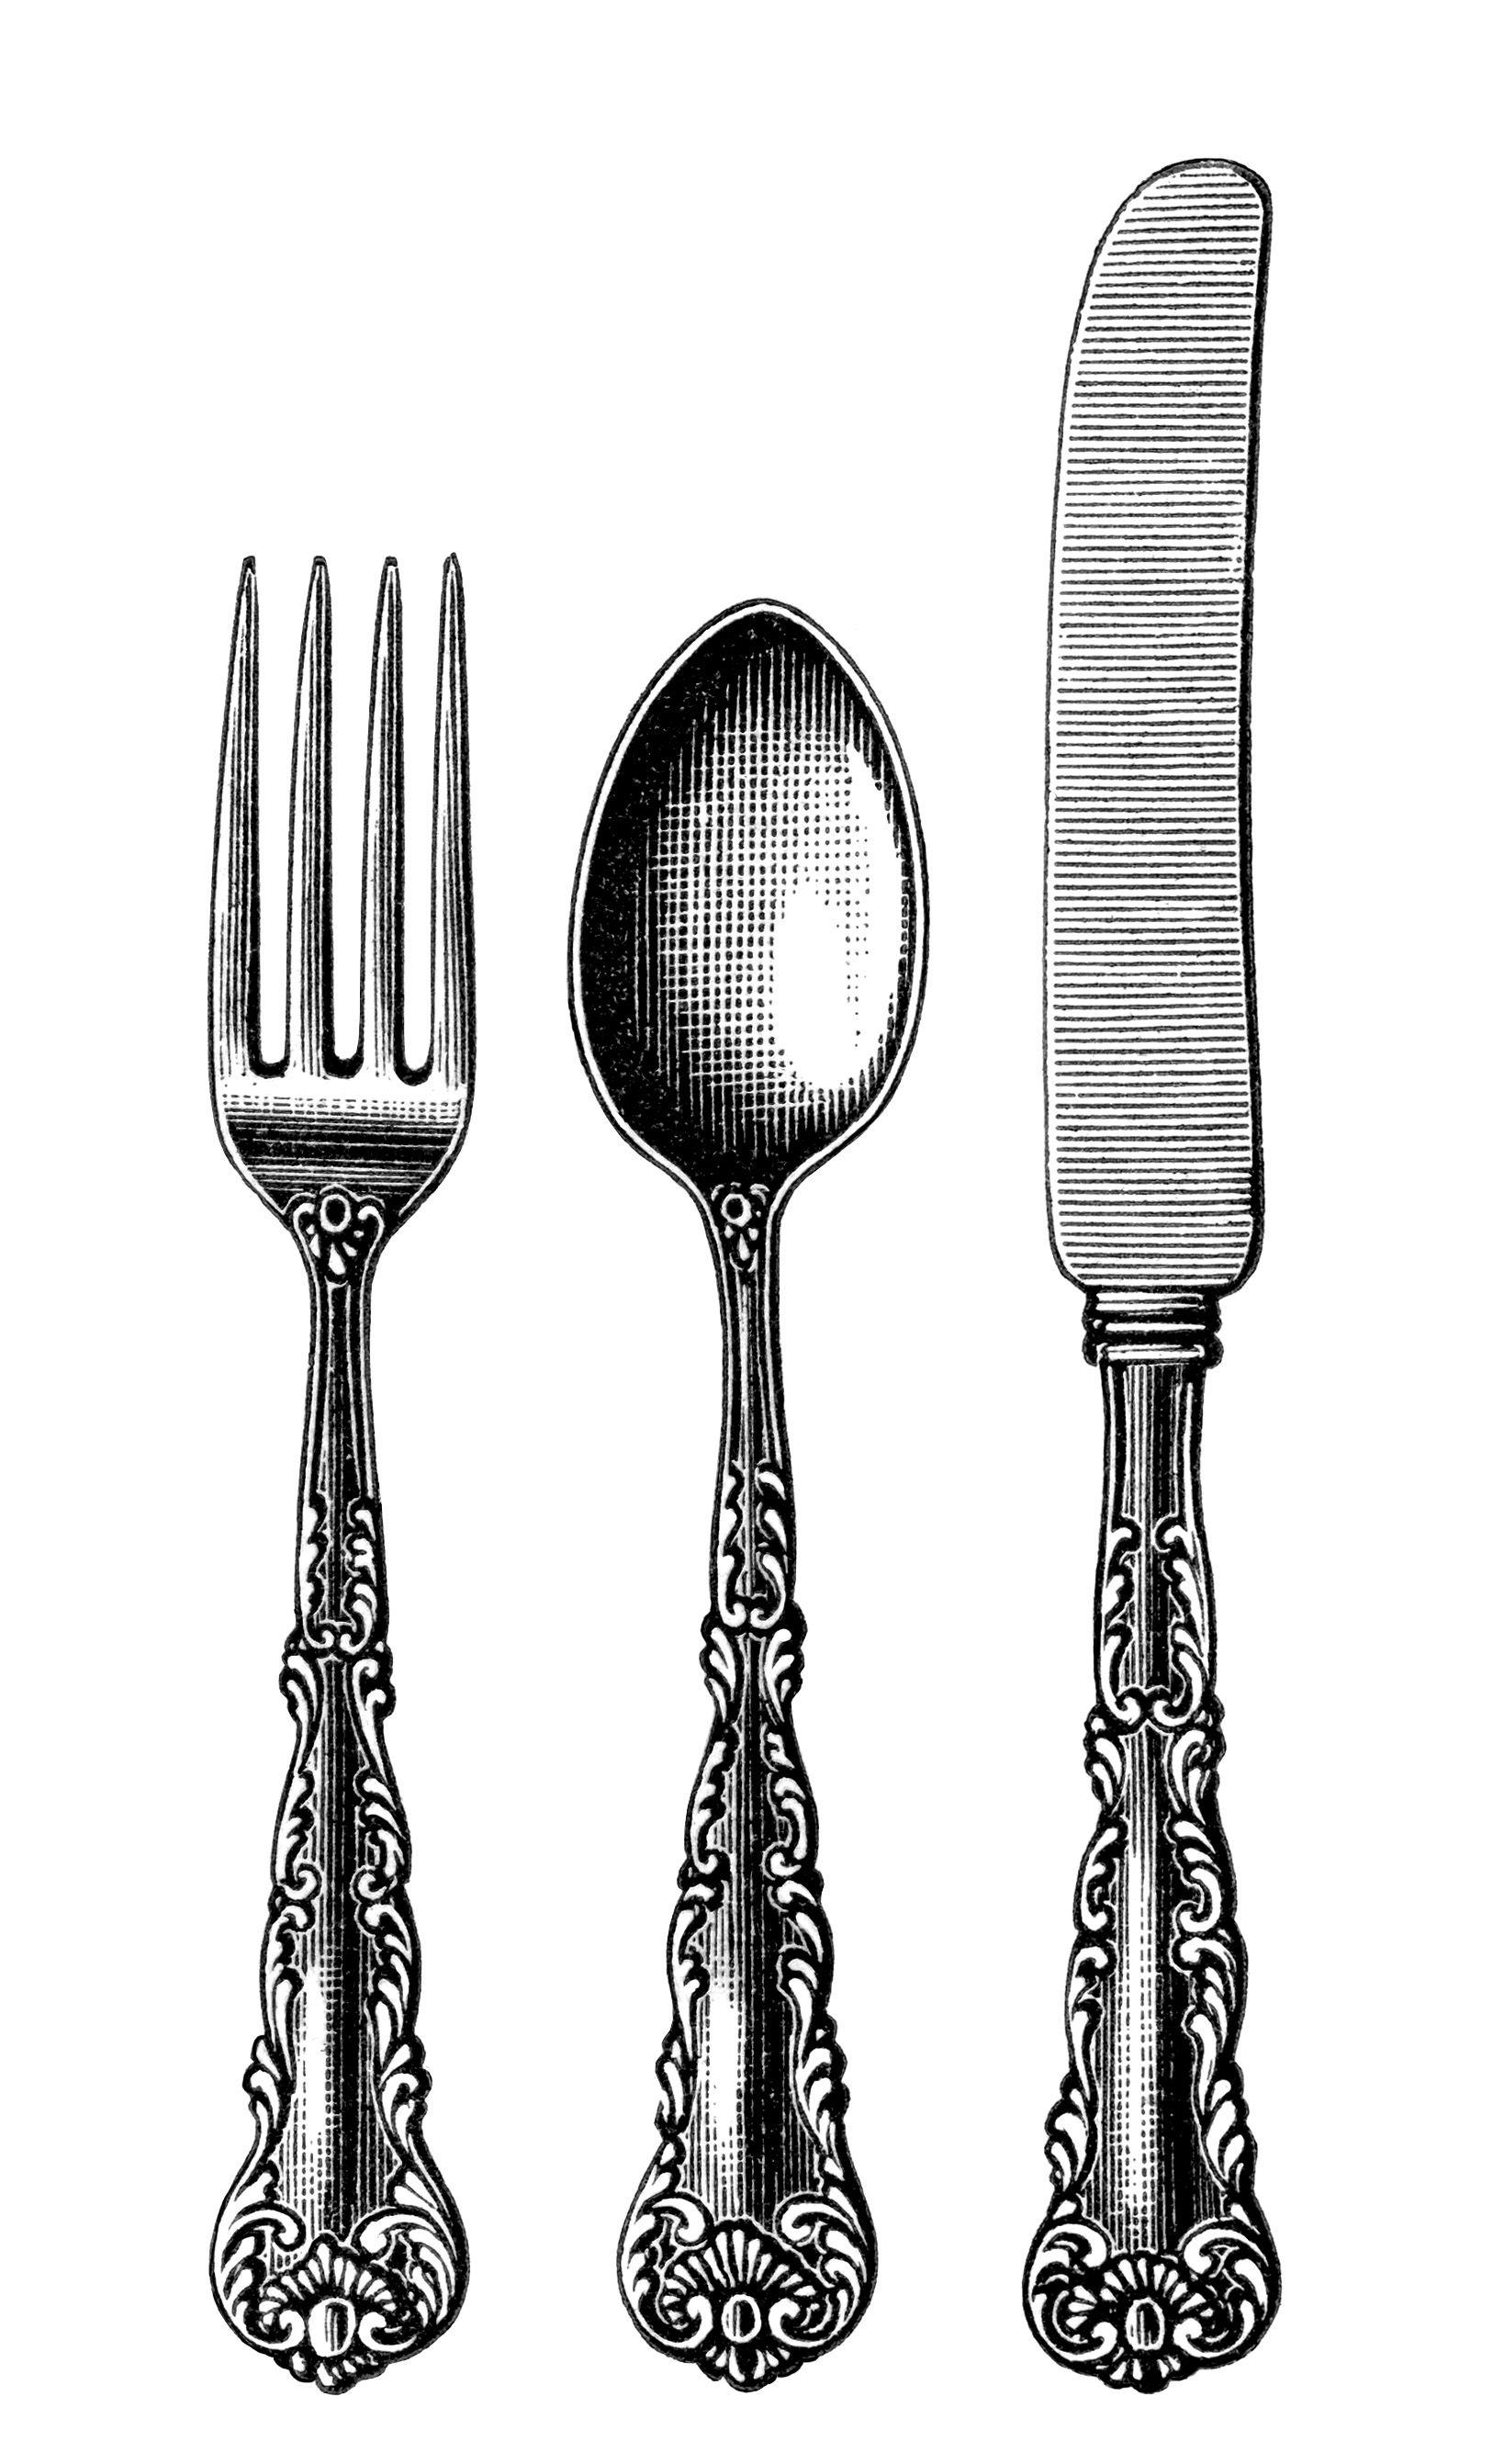 Fancy fork clipart picture transparent download Free download Vintage Fork Clipart for your creation. | Craft Ideas ... picture transparent download